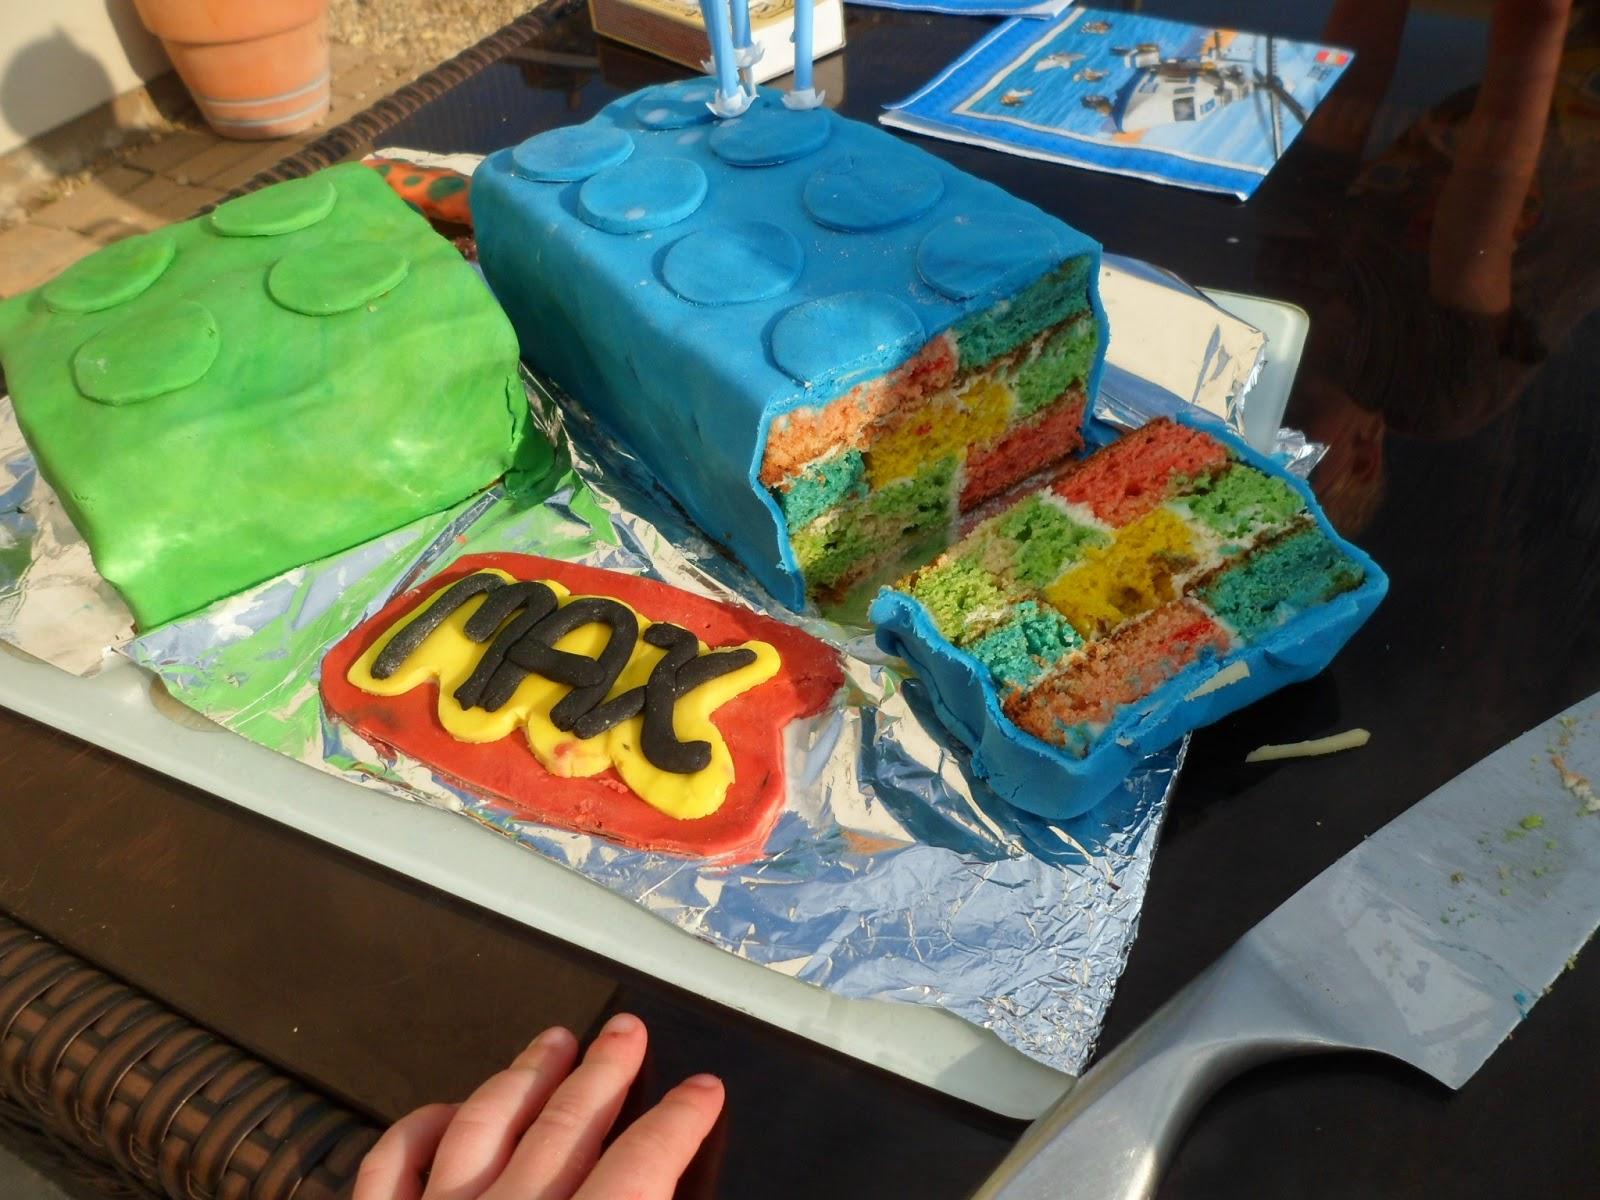 Hidden Design Cake Ideas : Cobble & Gobble: Hidden design lego brick cake